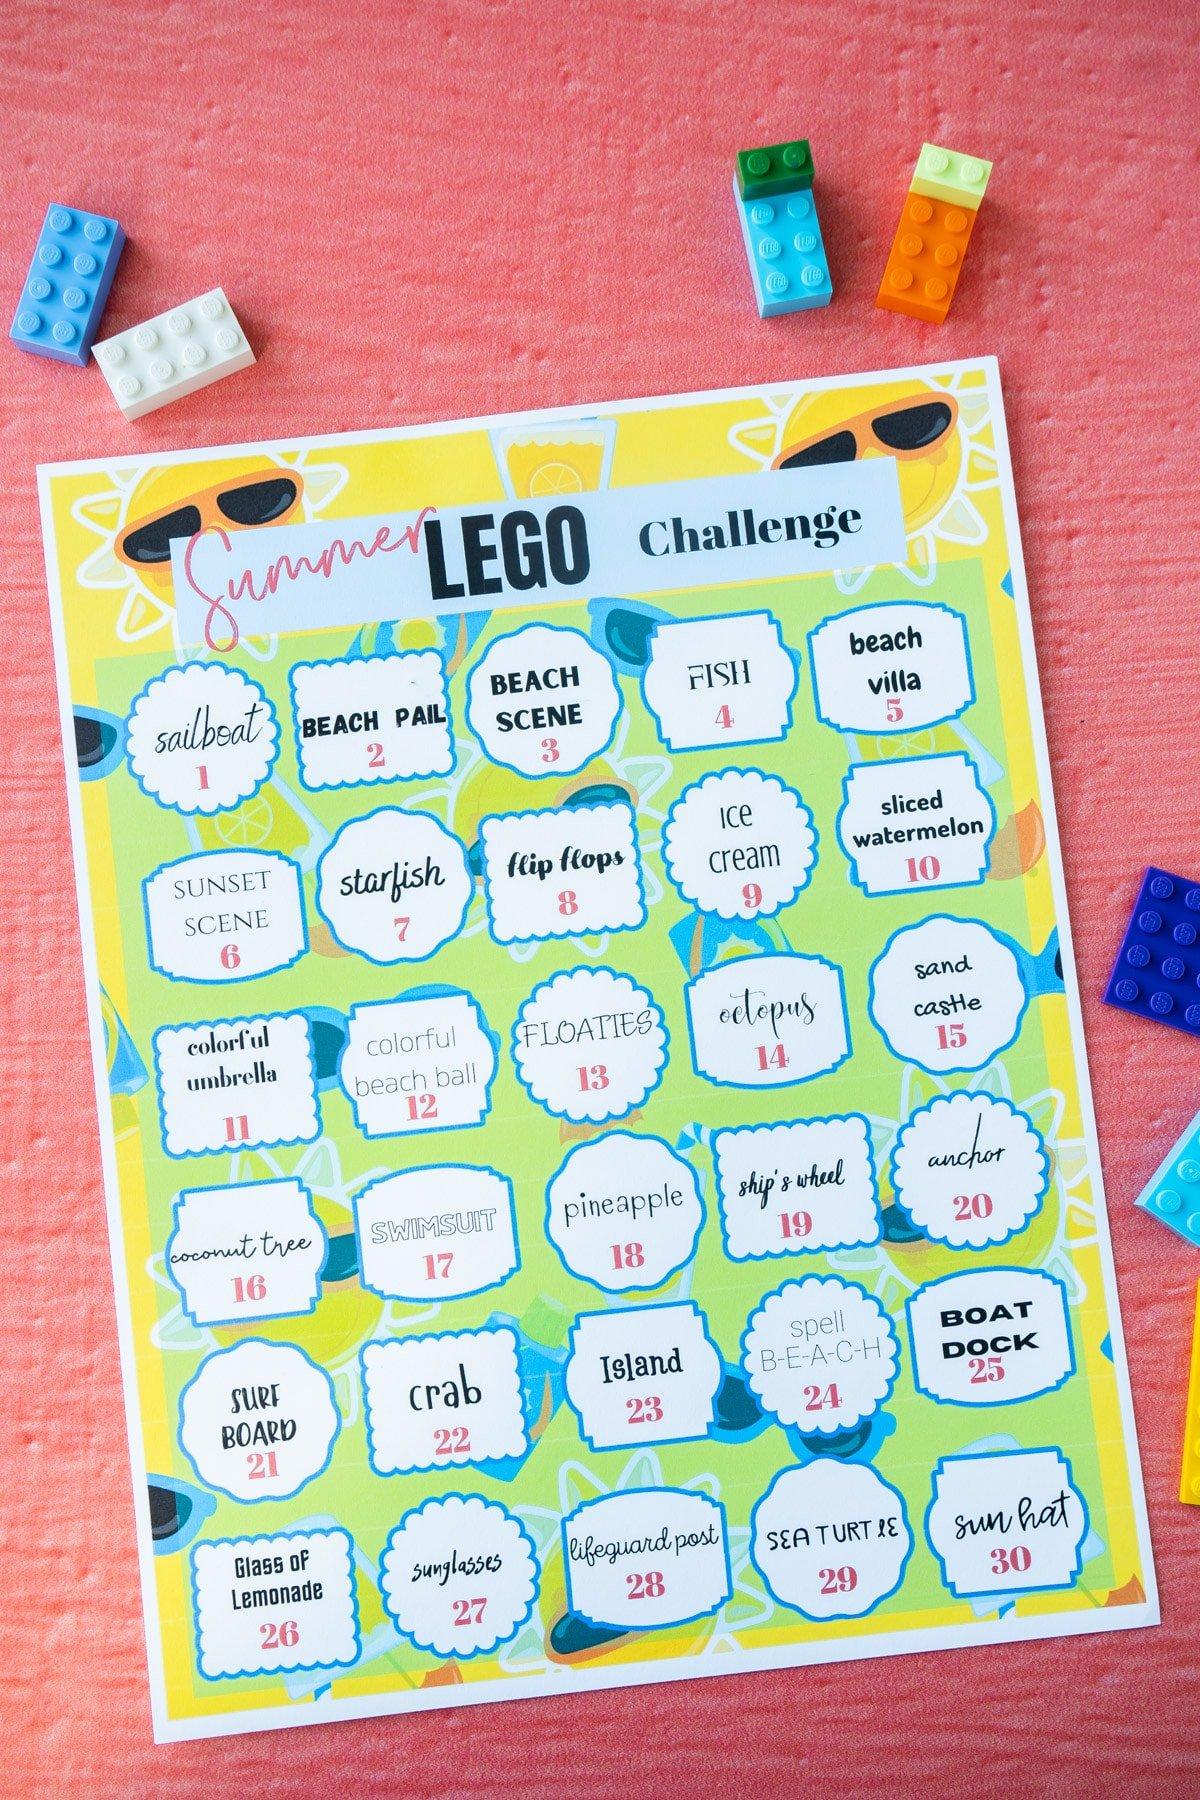 Printed summer lego challenge ideas